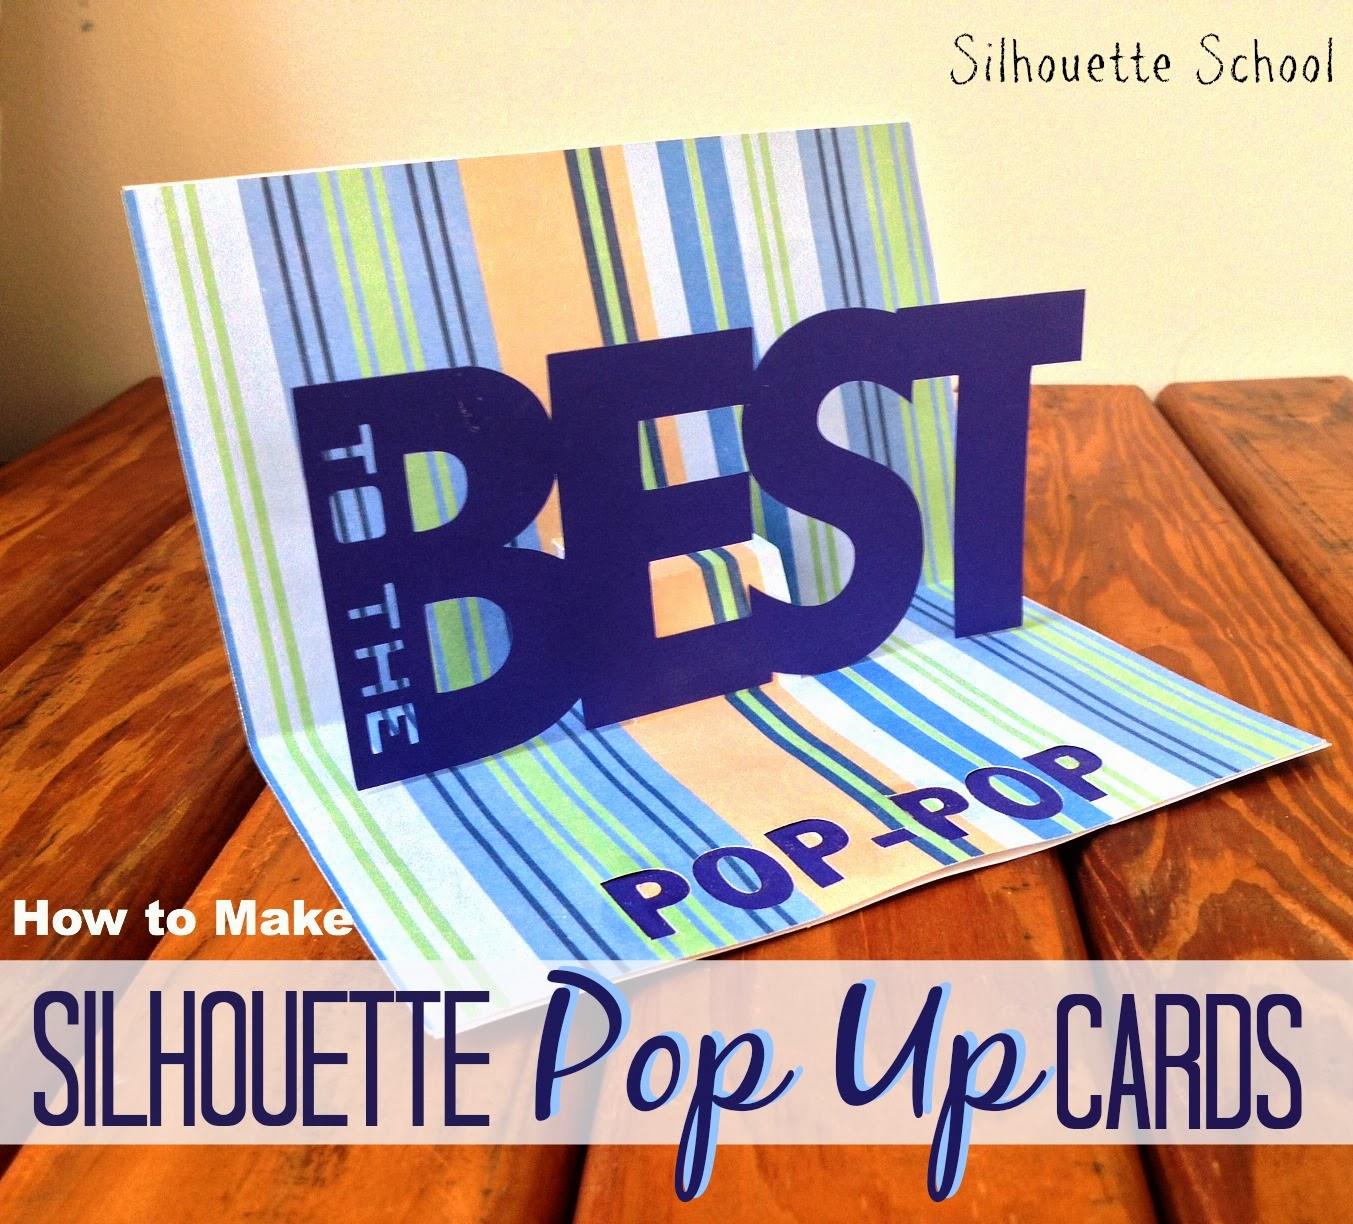 basic silhouette pop up card tutorial free .studio pop up, Birthday card